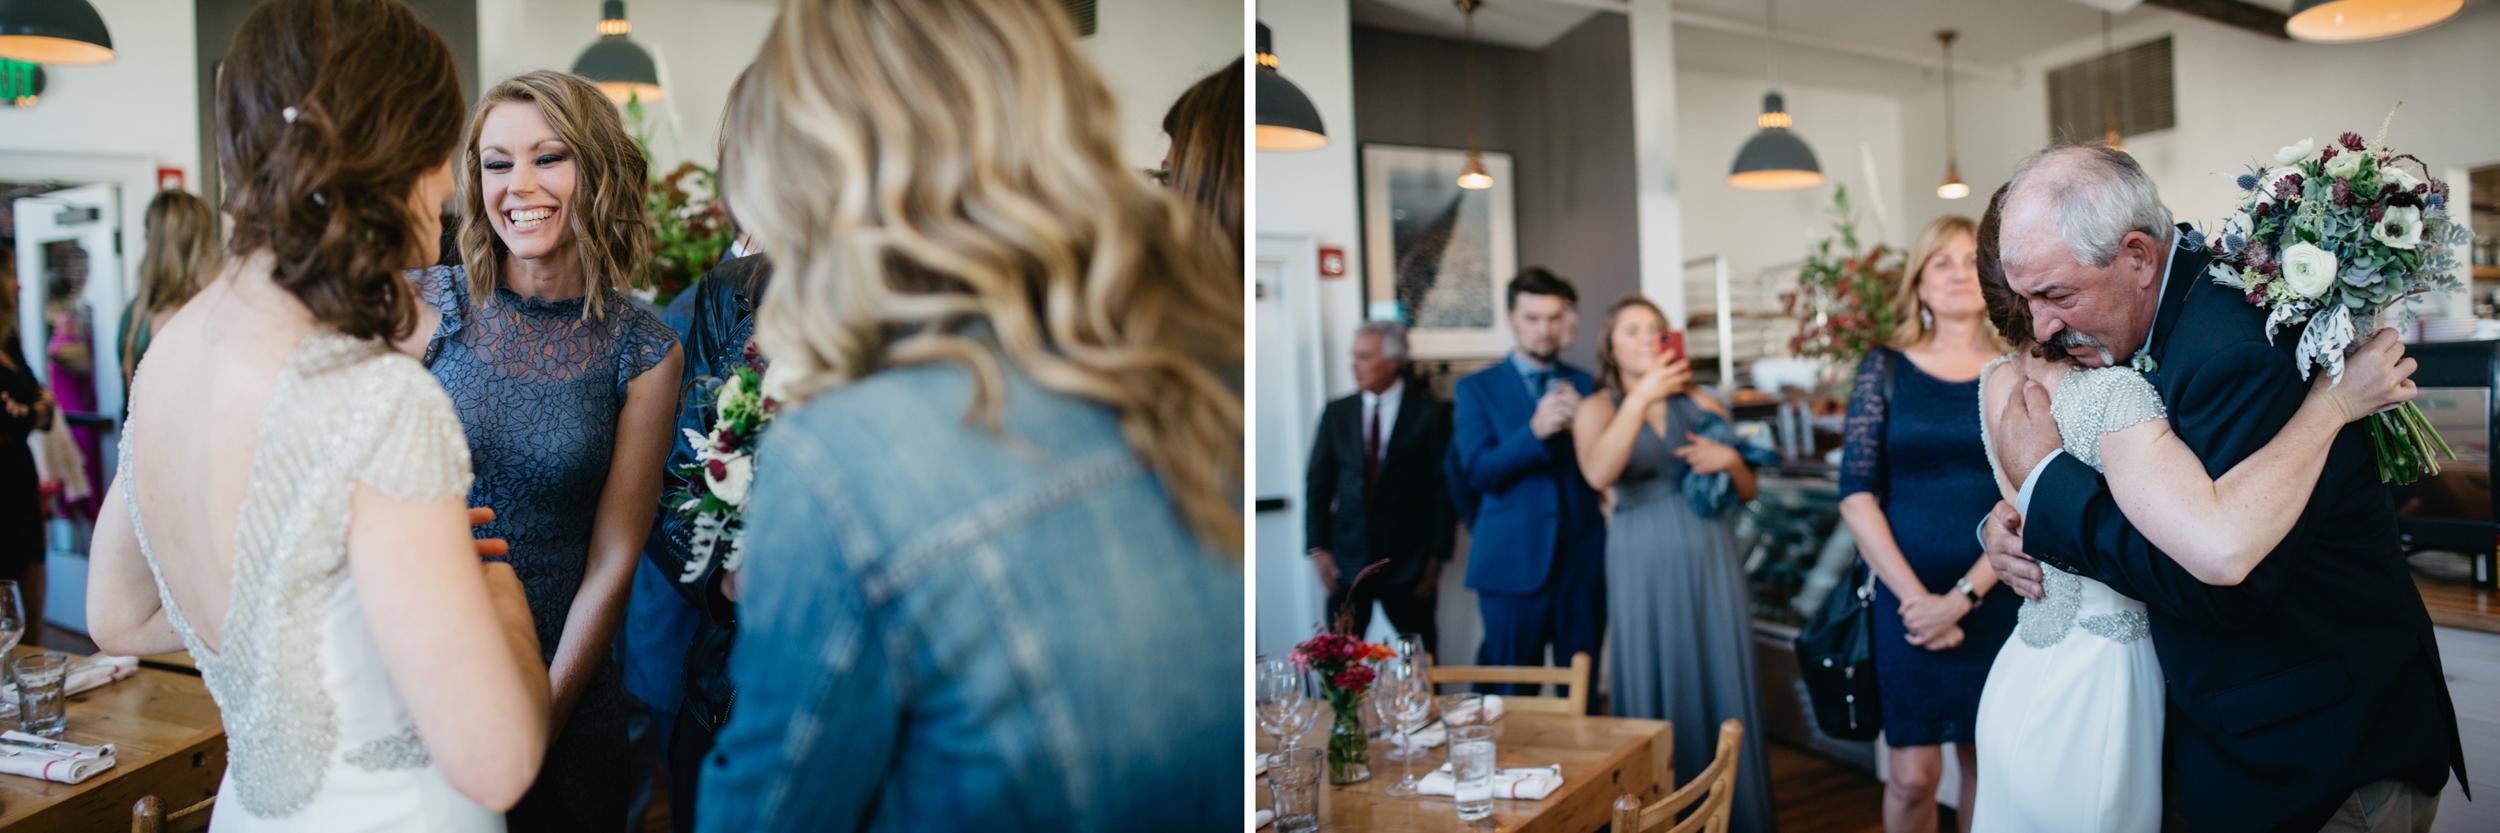 Mackenzie_Collins_Maine_wedding_in_Rockport_Union_hall_Nina_June_020.jpg